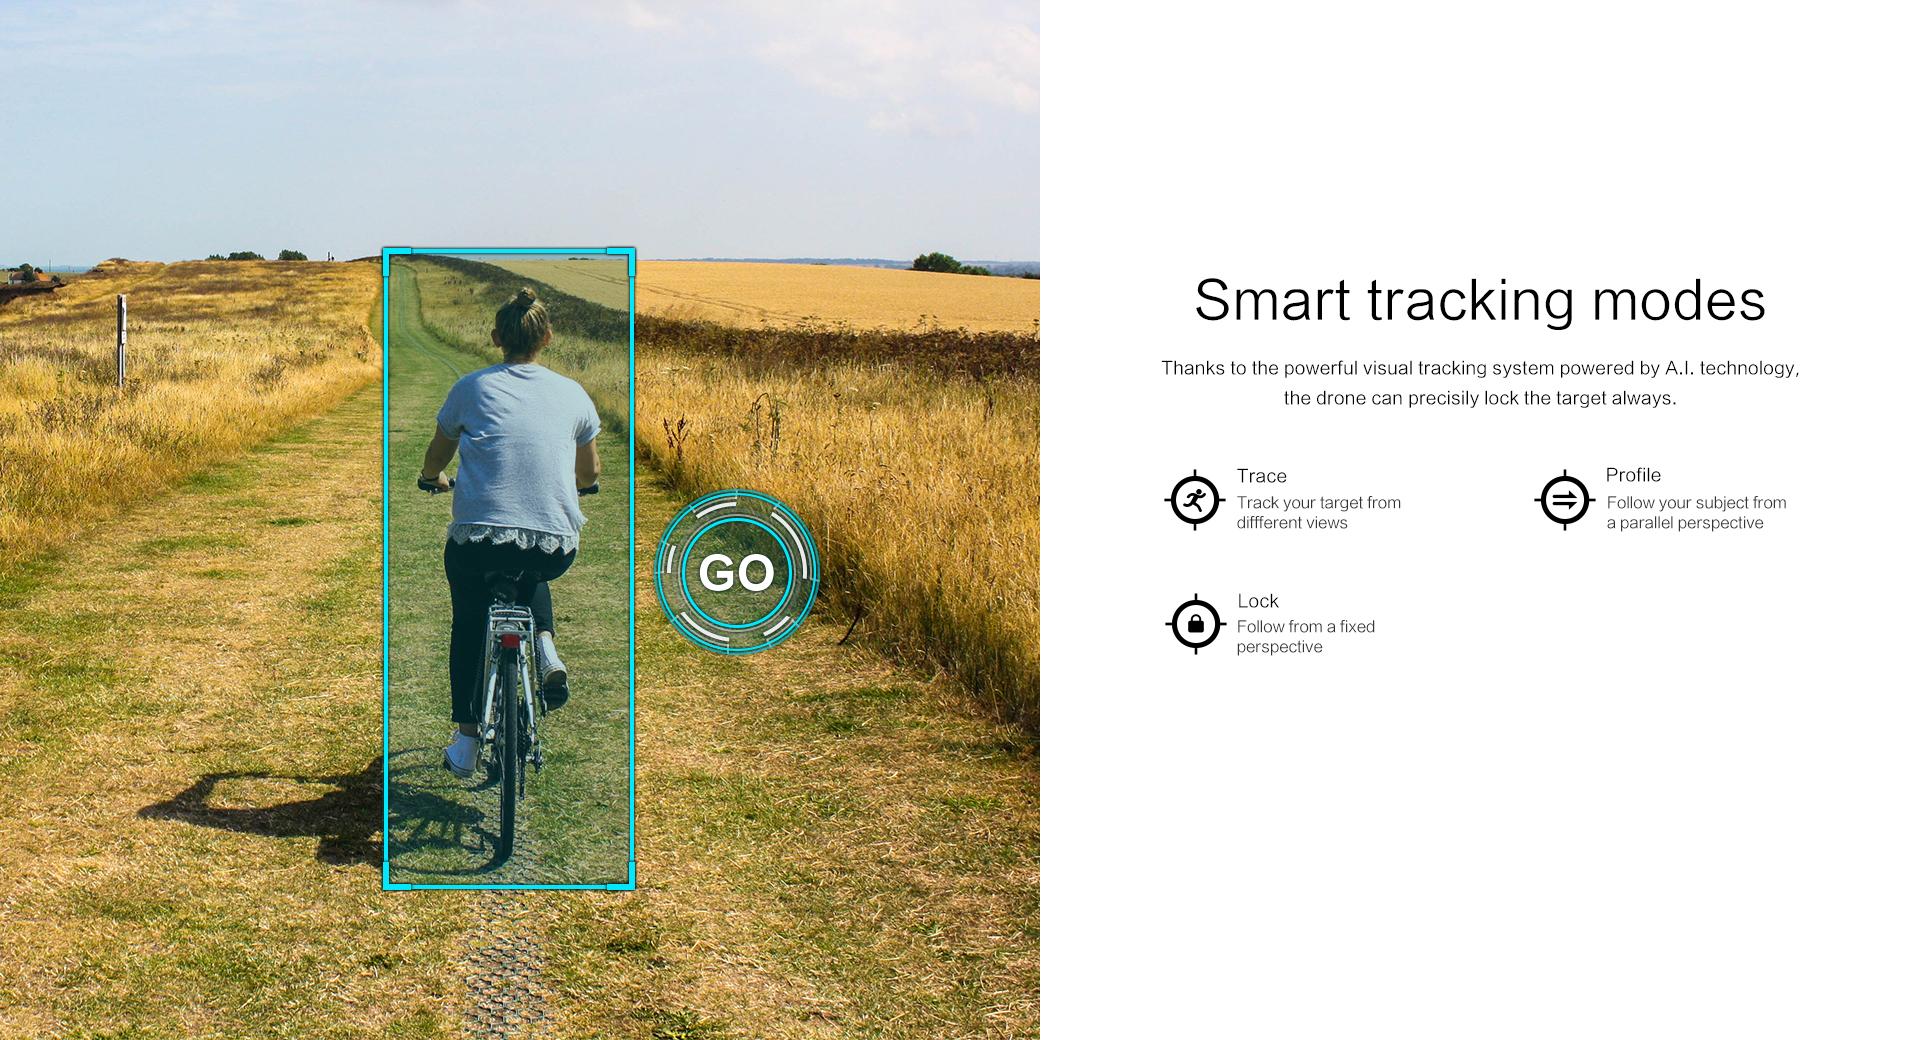 FIMI X8 SE smart tracking modes